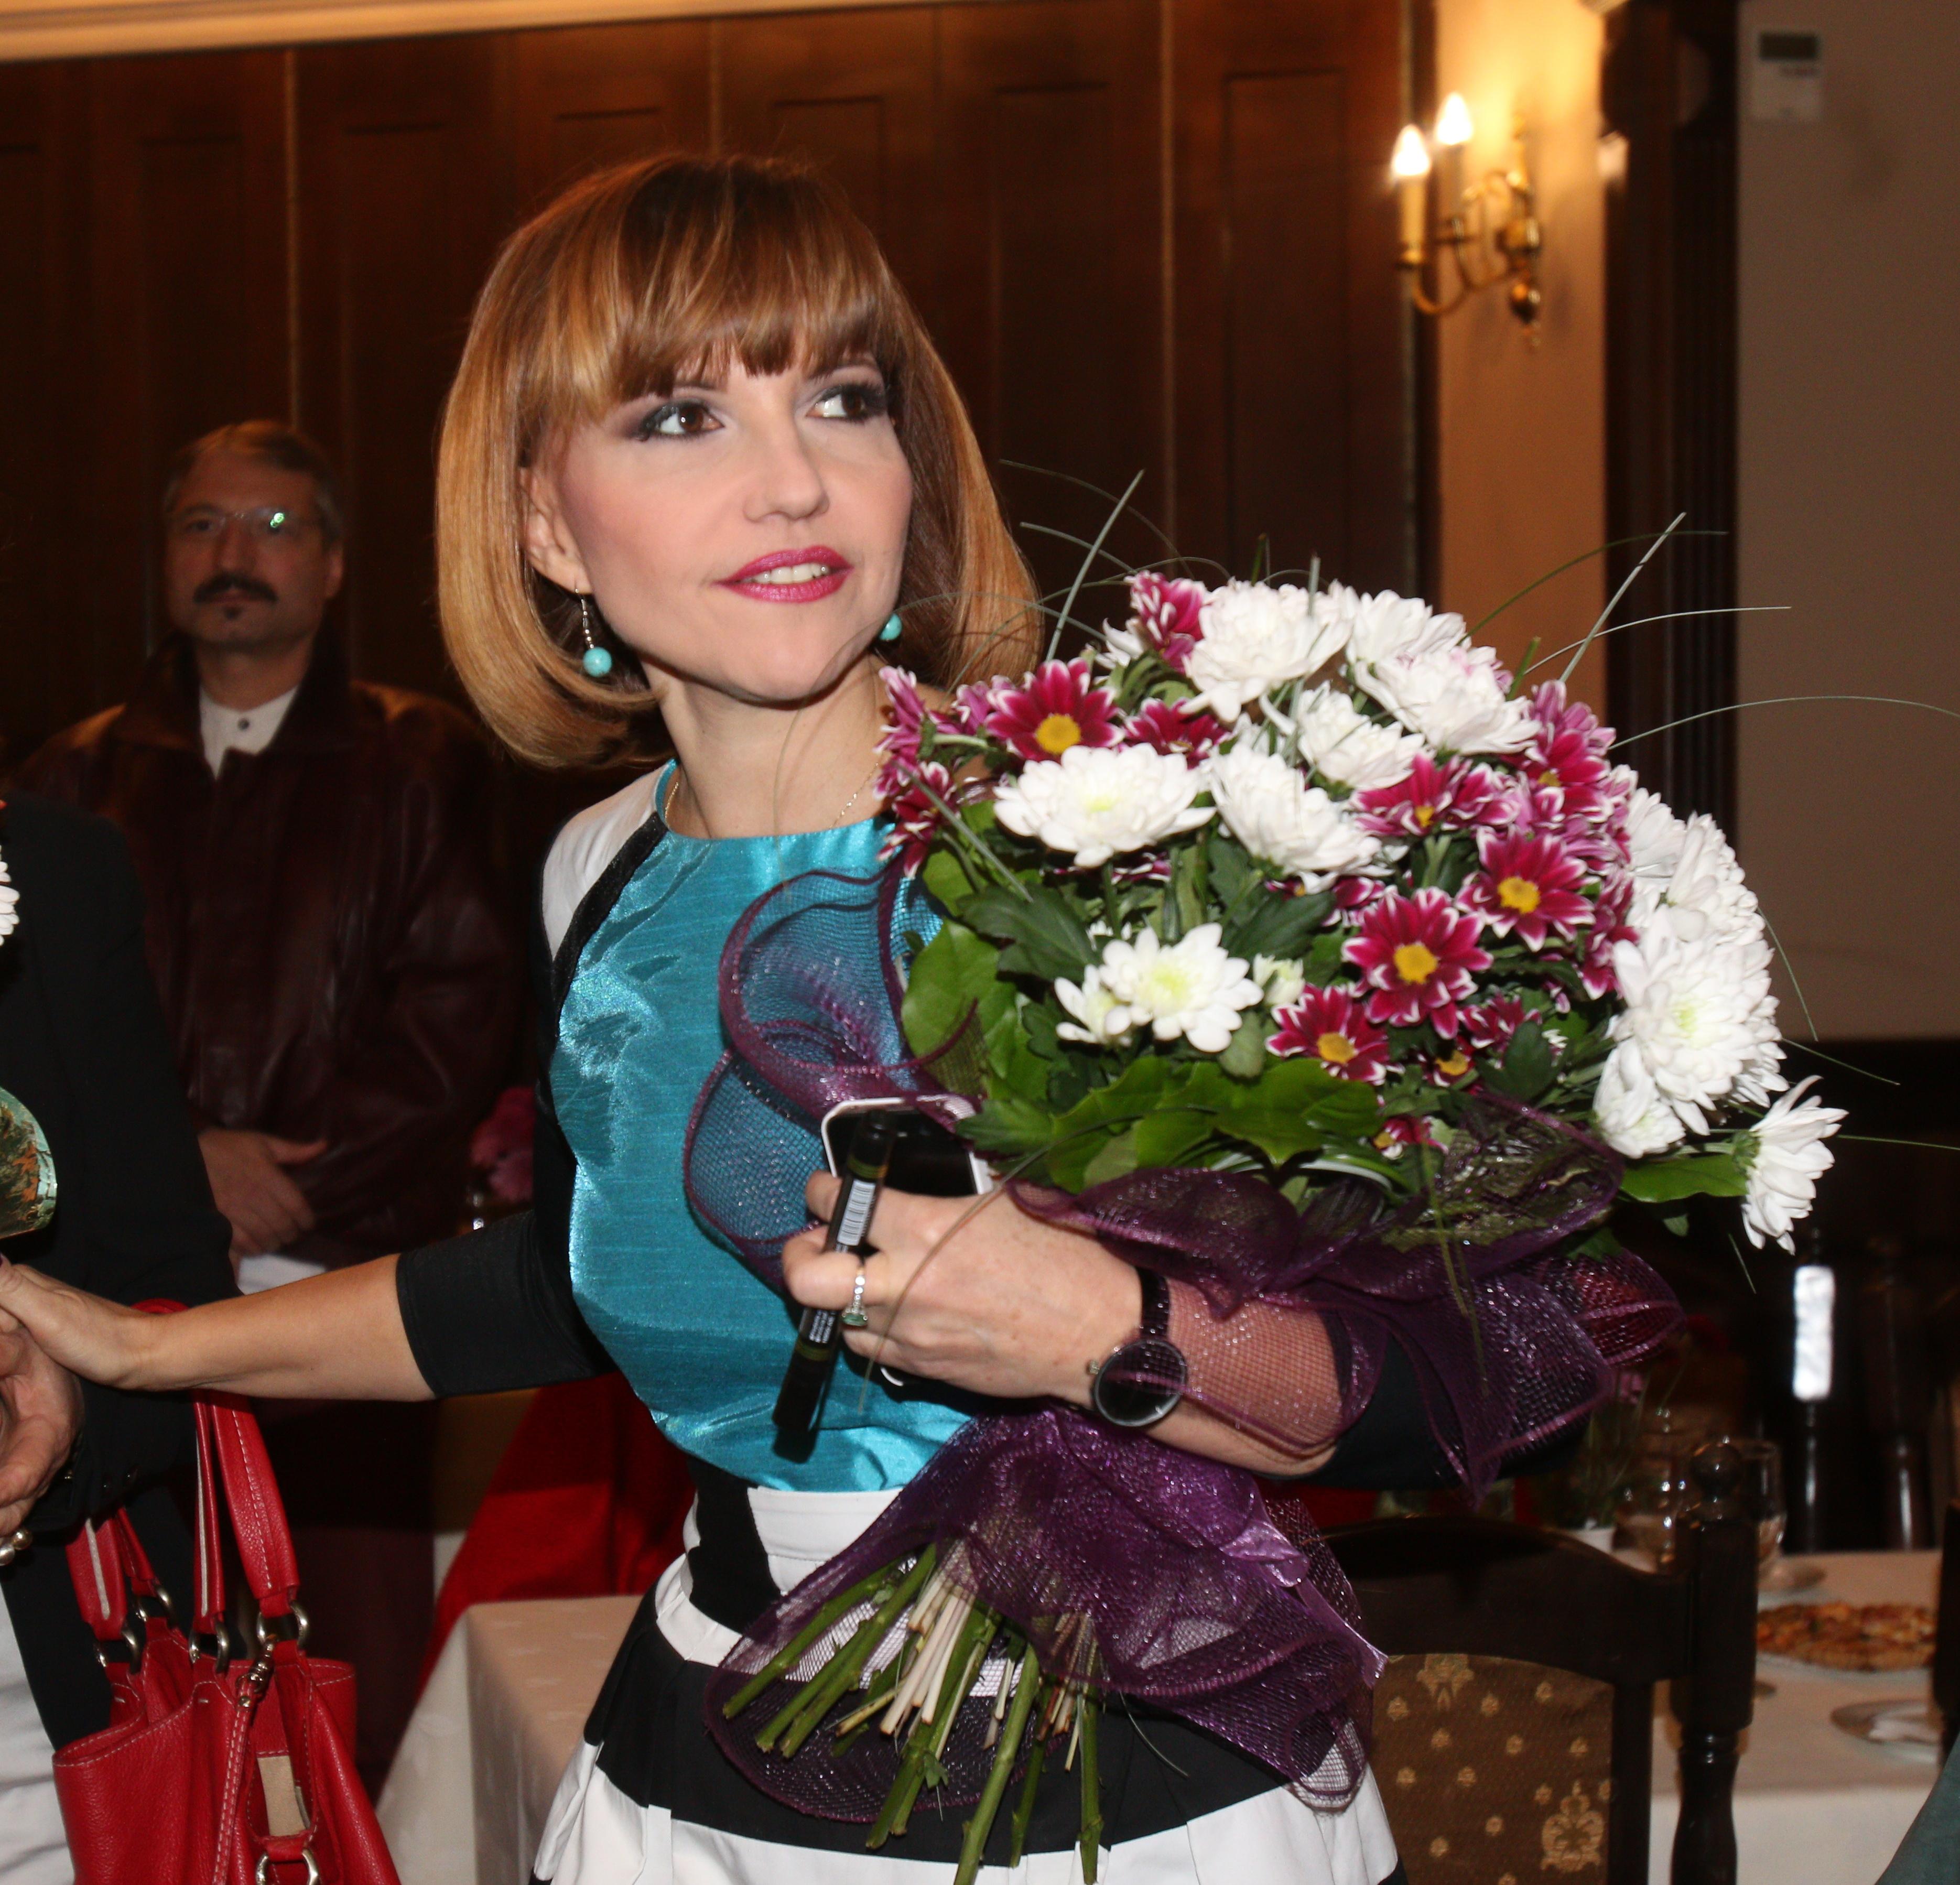 Marina Almasan este inconjurata de oameni care o iubesc